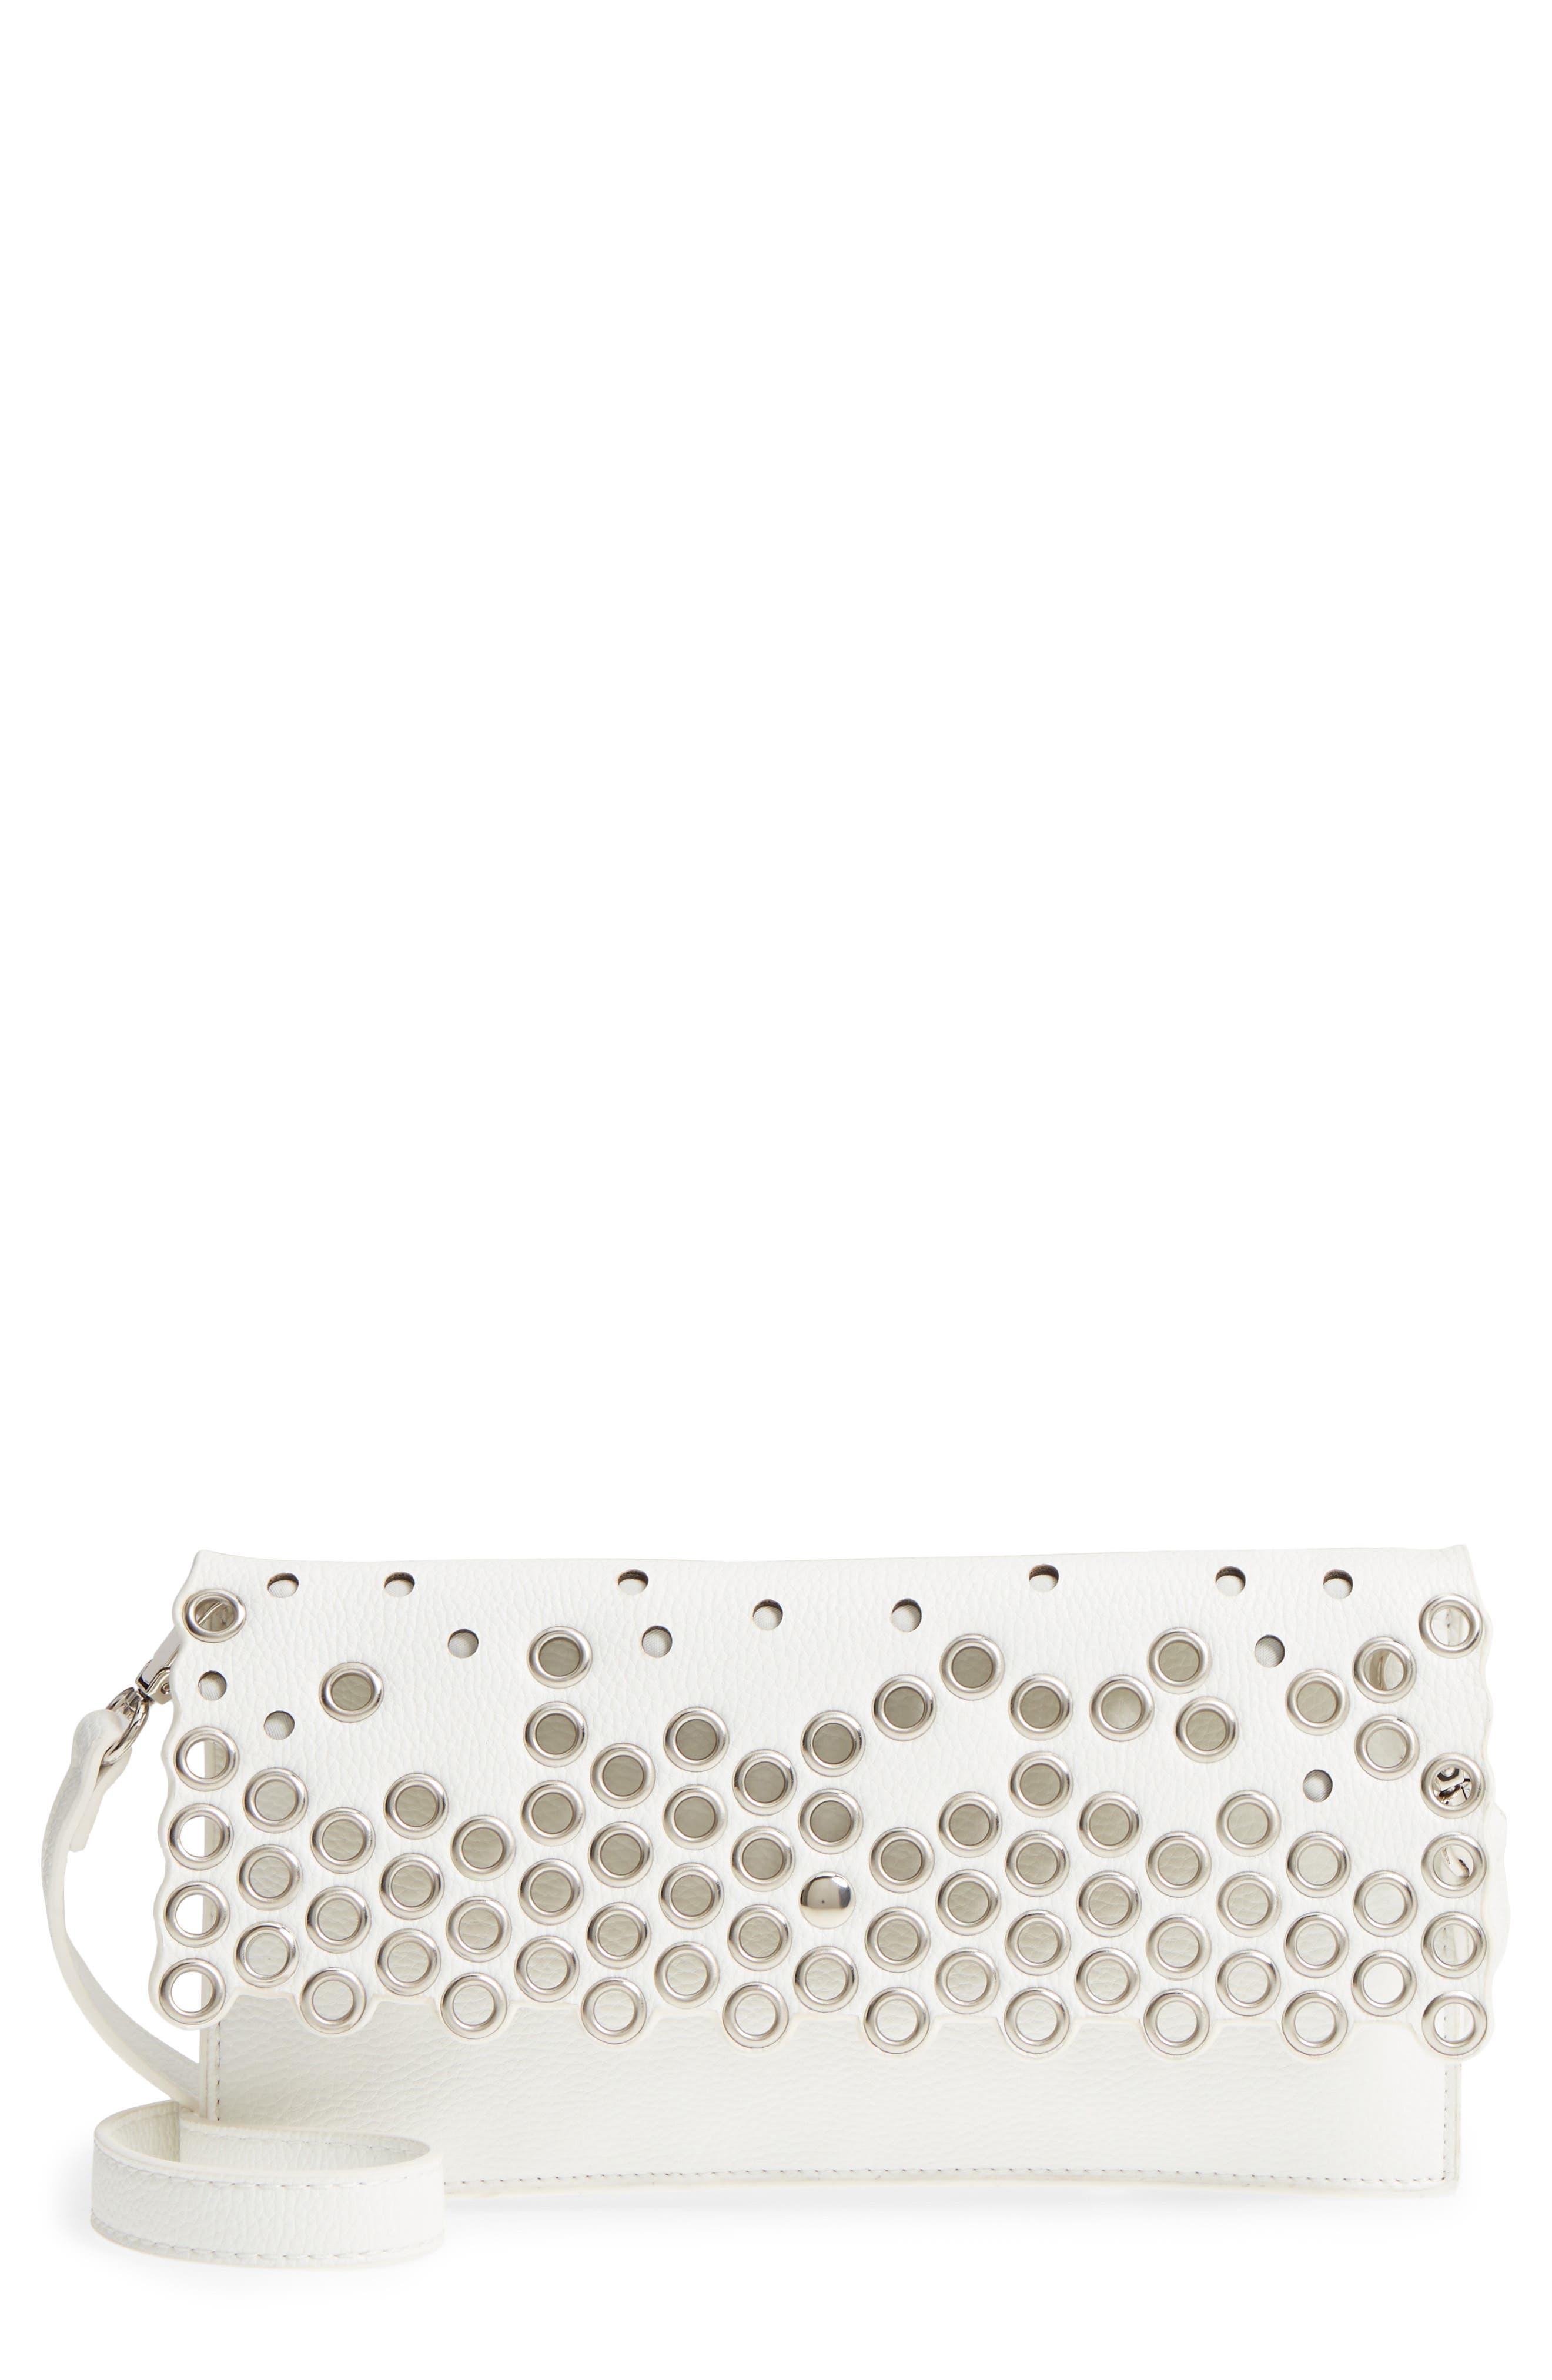 SONDRA ROBERTS Grommet Convertible Crossbody Bag, Main, color, 100